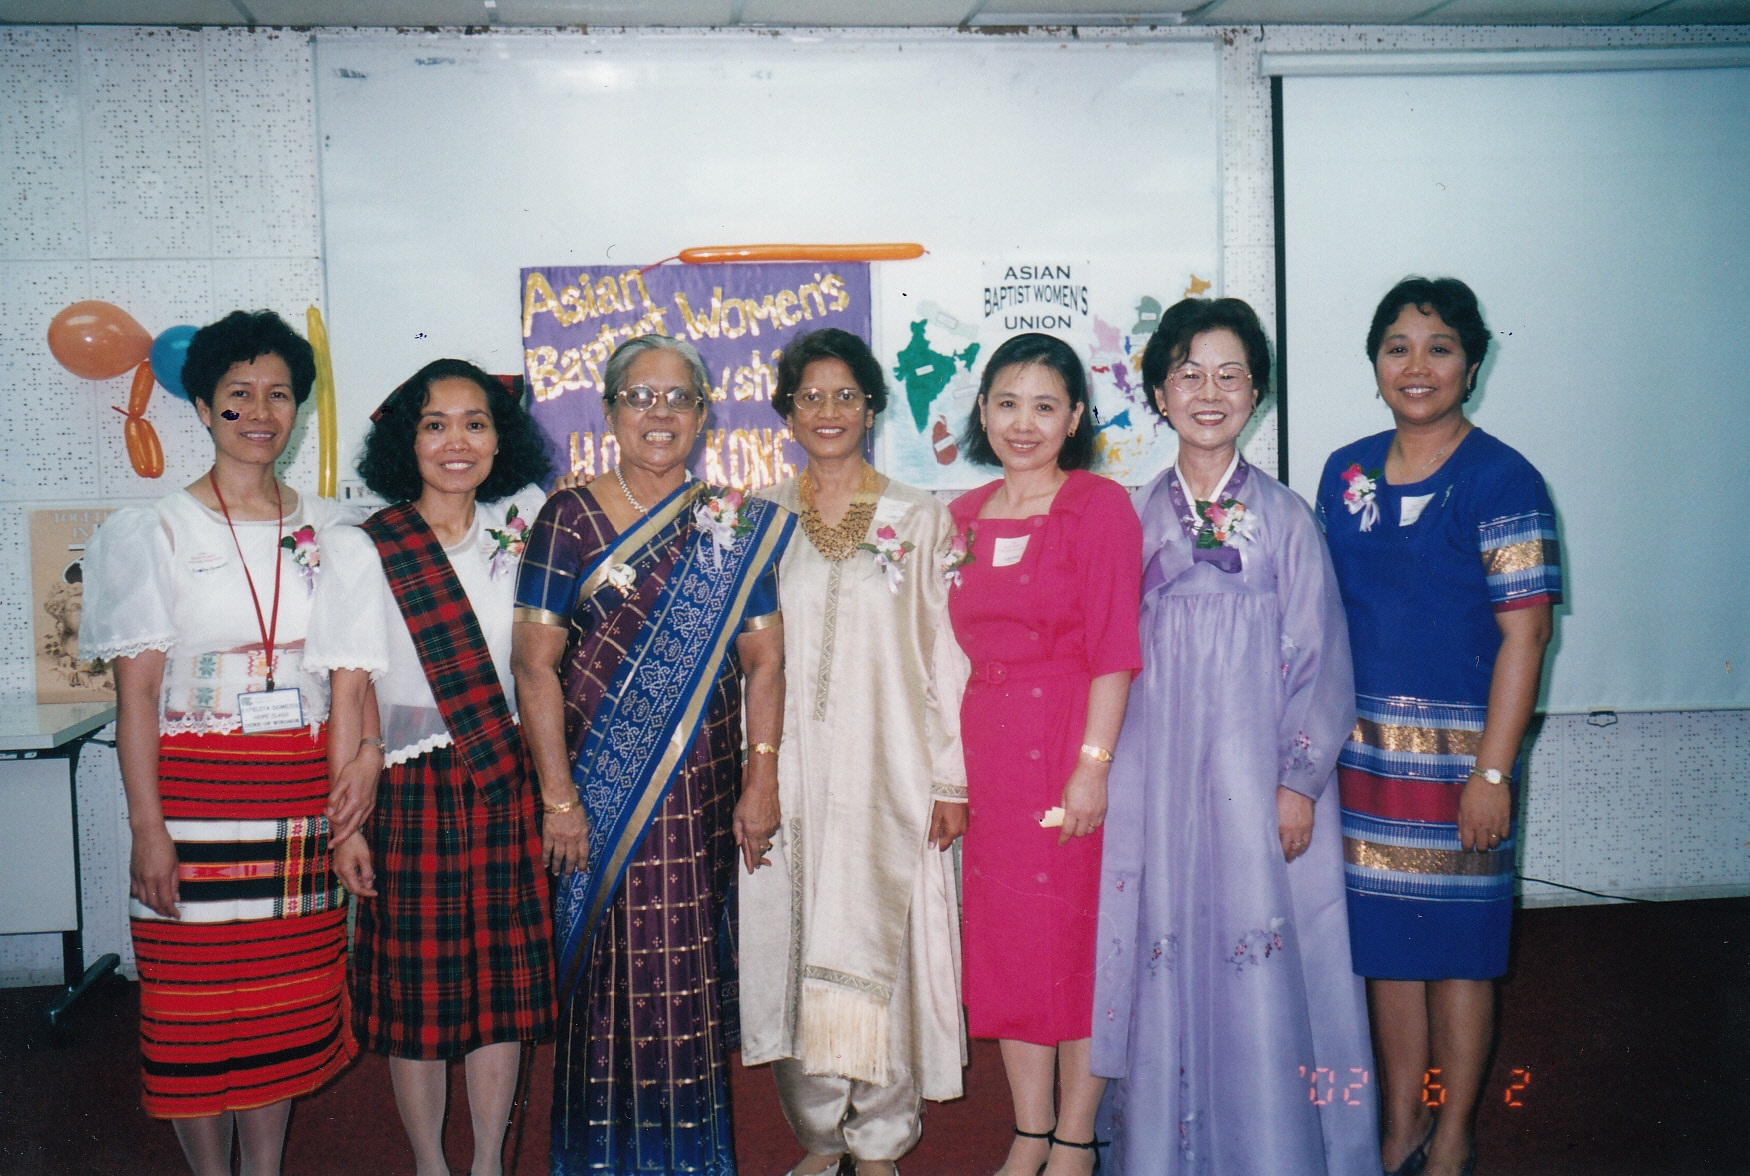 ASIAN BAPTIST WOMEN'S FELLOWSHIP, HK